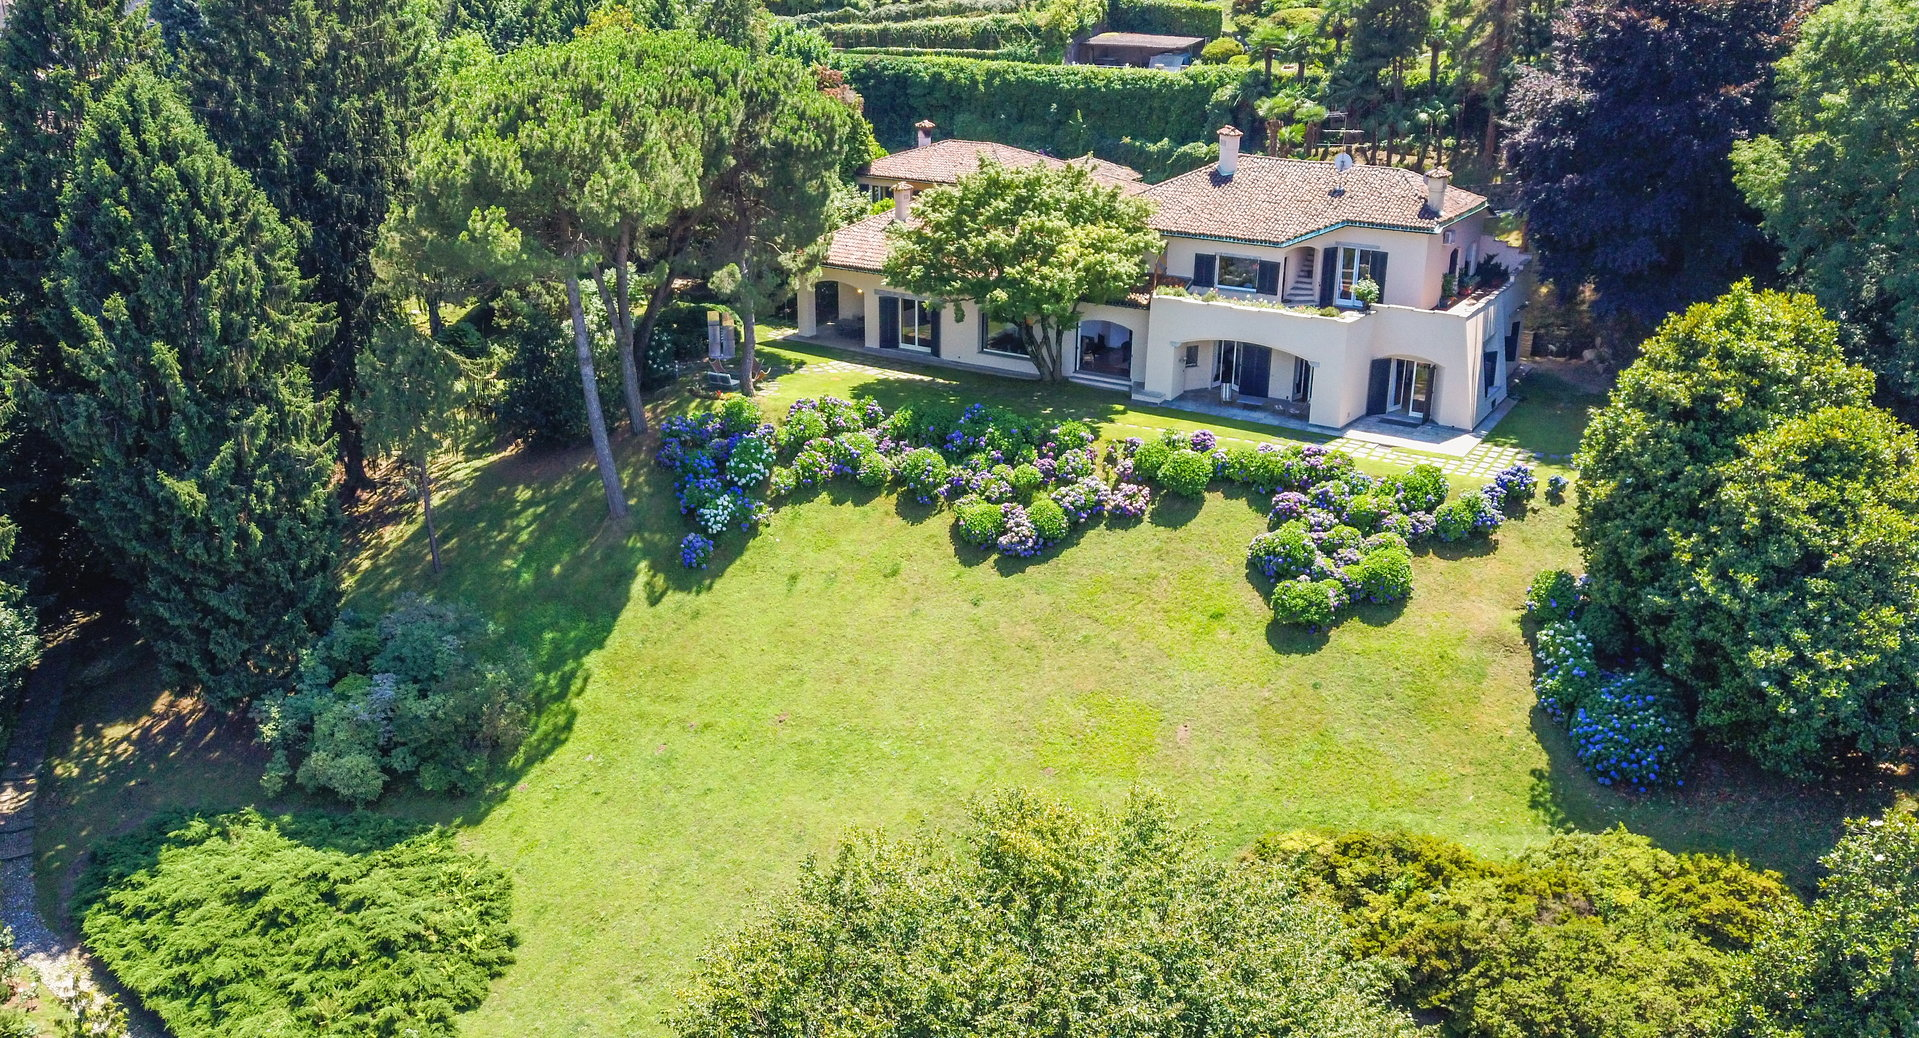 Elegant lake view villa for sale in Stresa - villa with garden